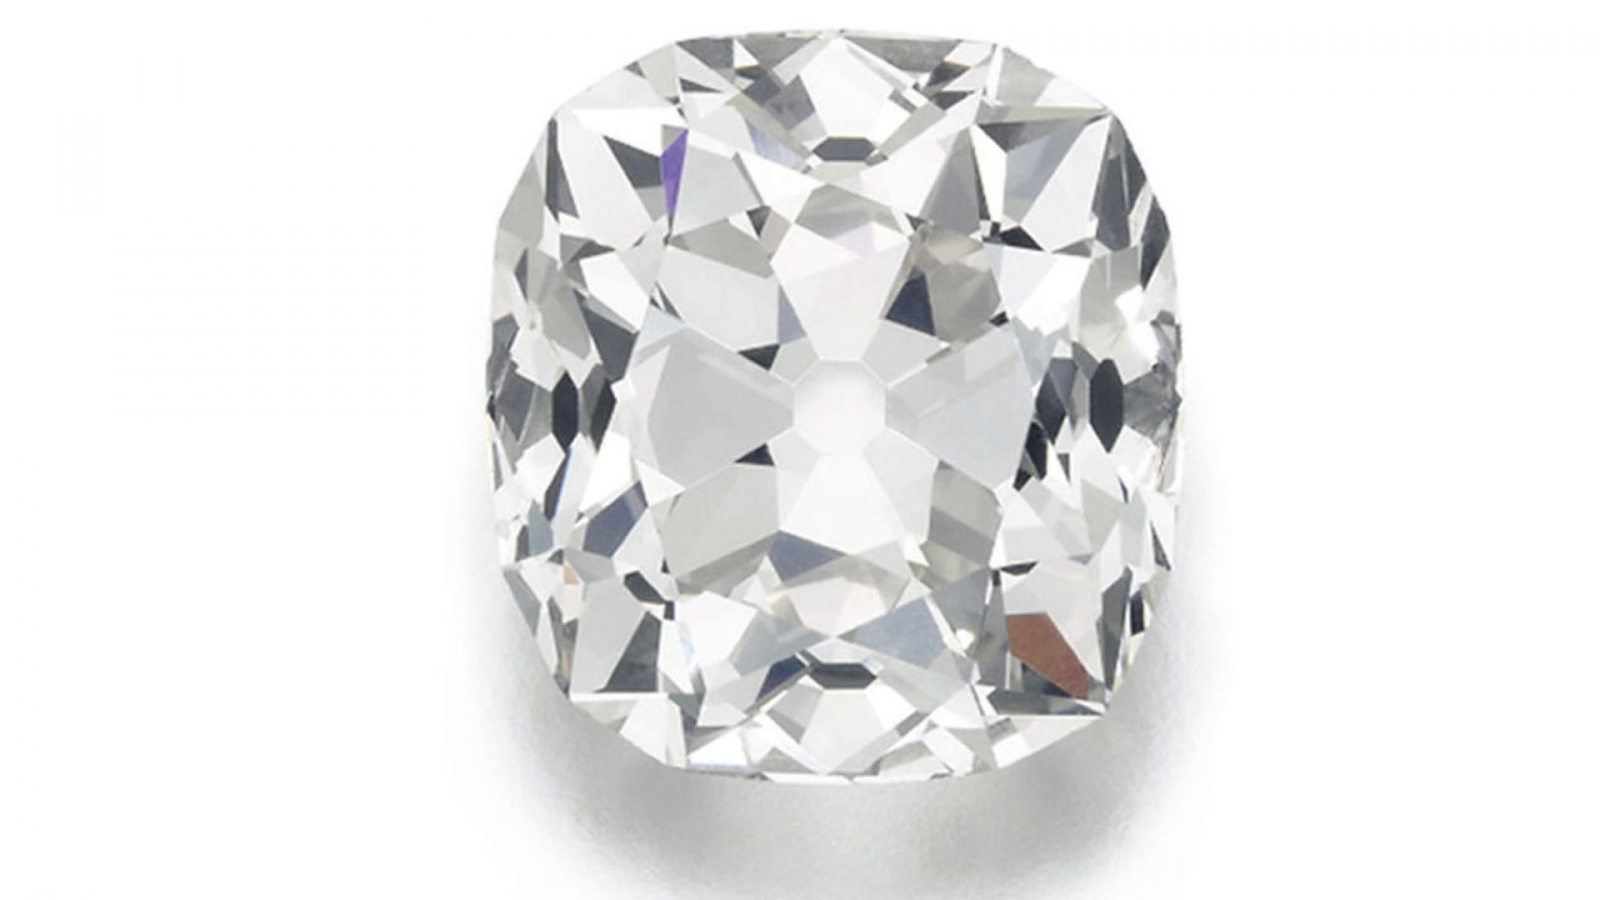 Diamond sotheby's